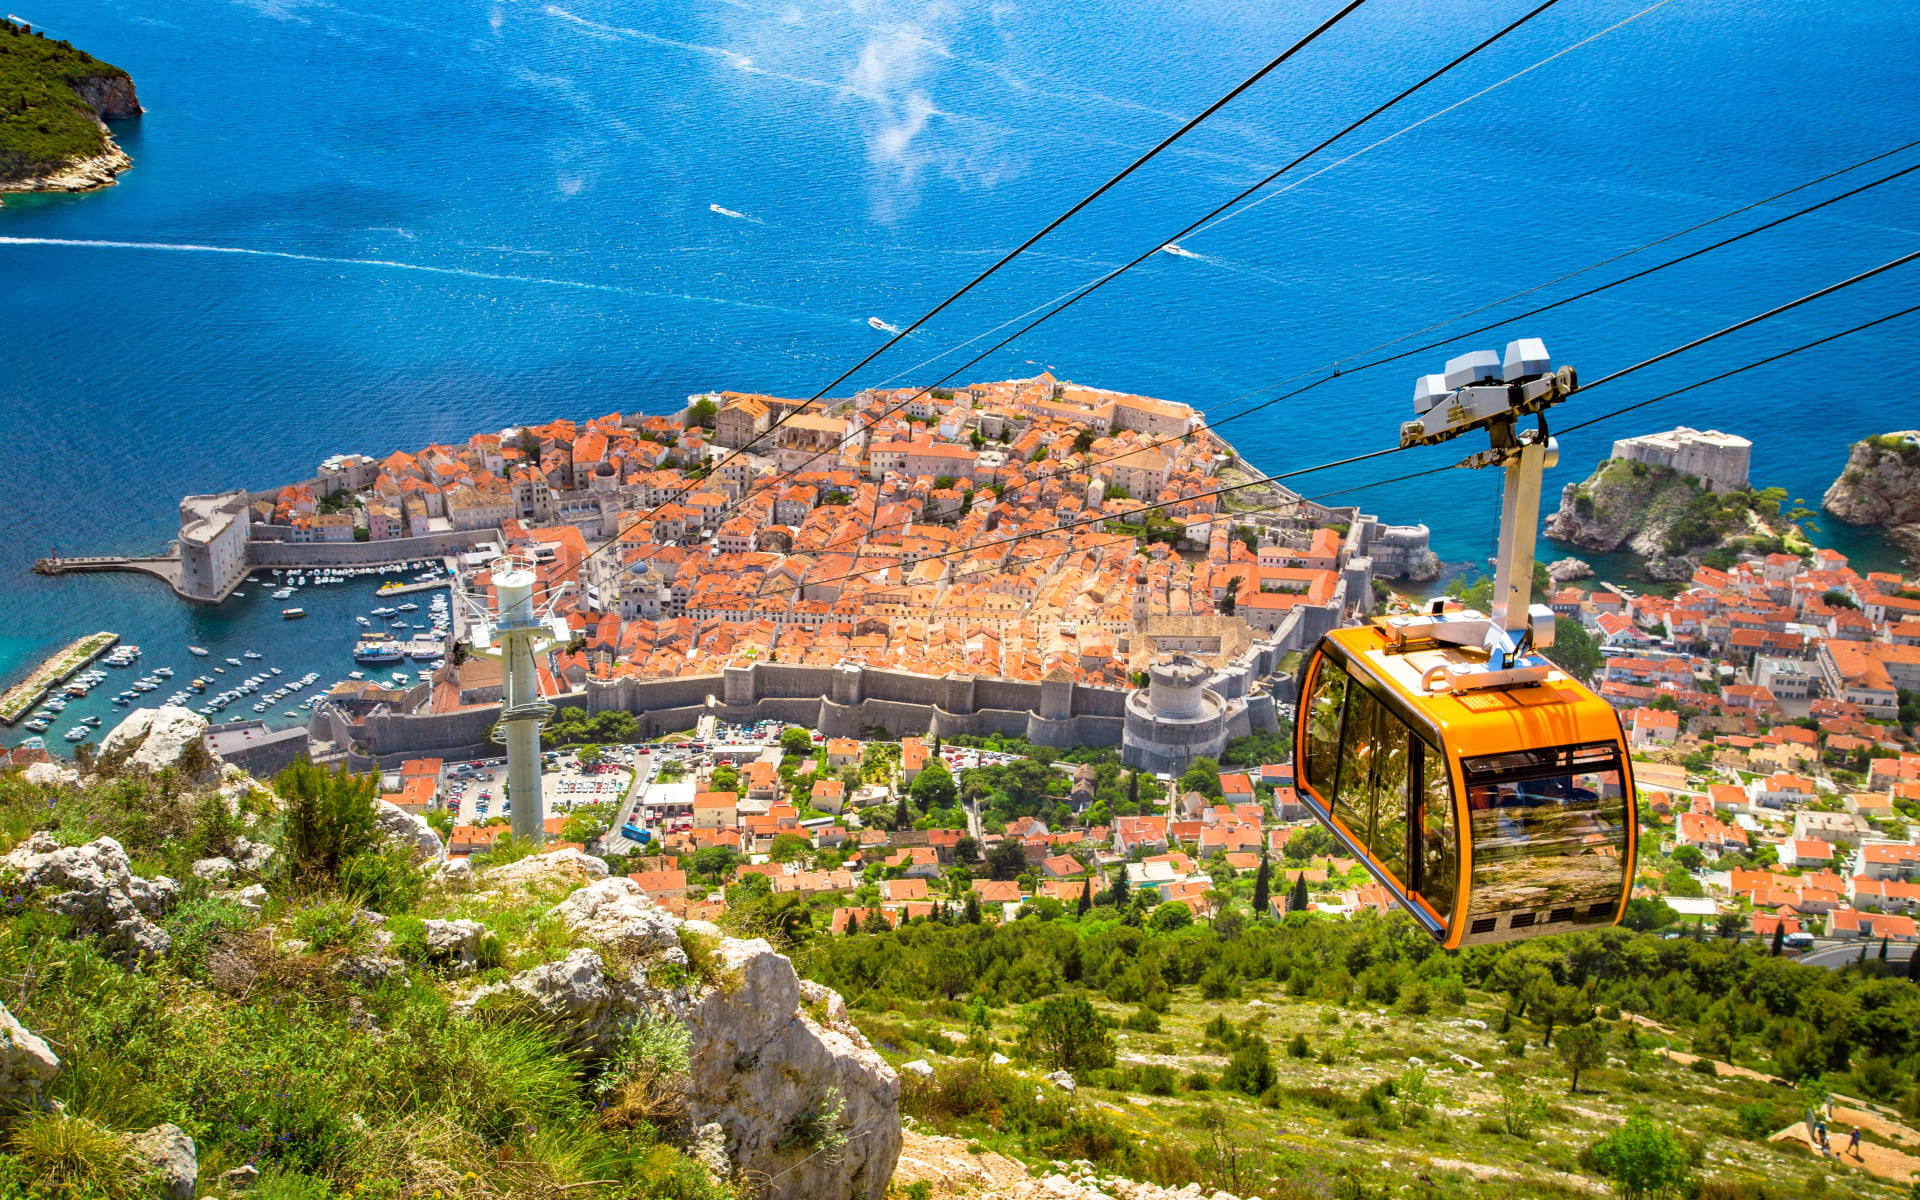 Badeferien im Sun Gardens Dubrovnik: Dubrovnik_Seilbahn_